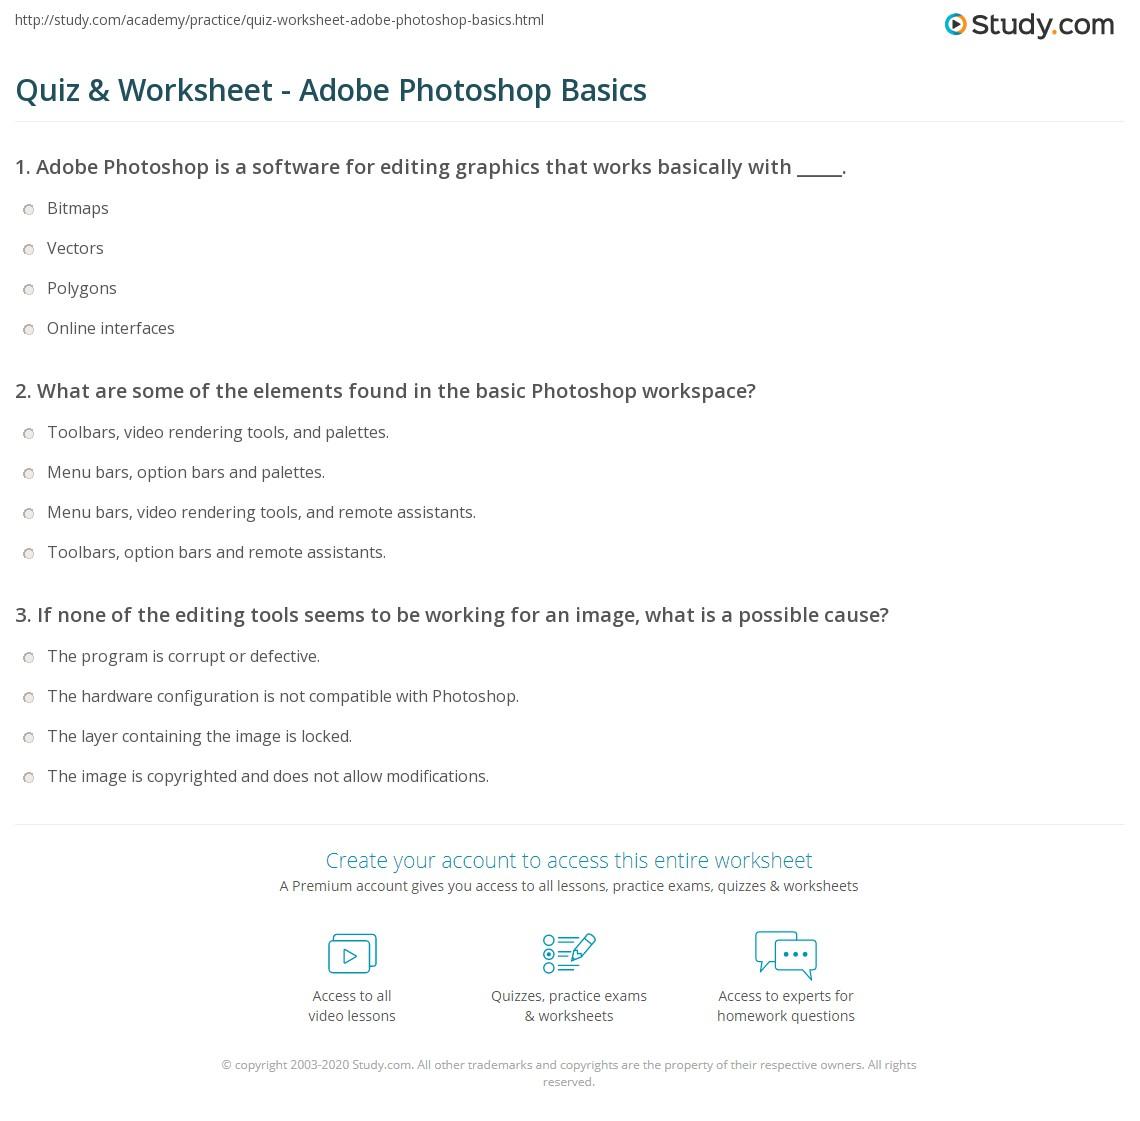 Quiz & Worksheet - Adobe Photoshop Basics | Study com